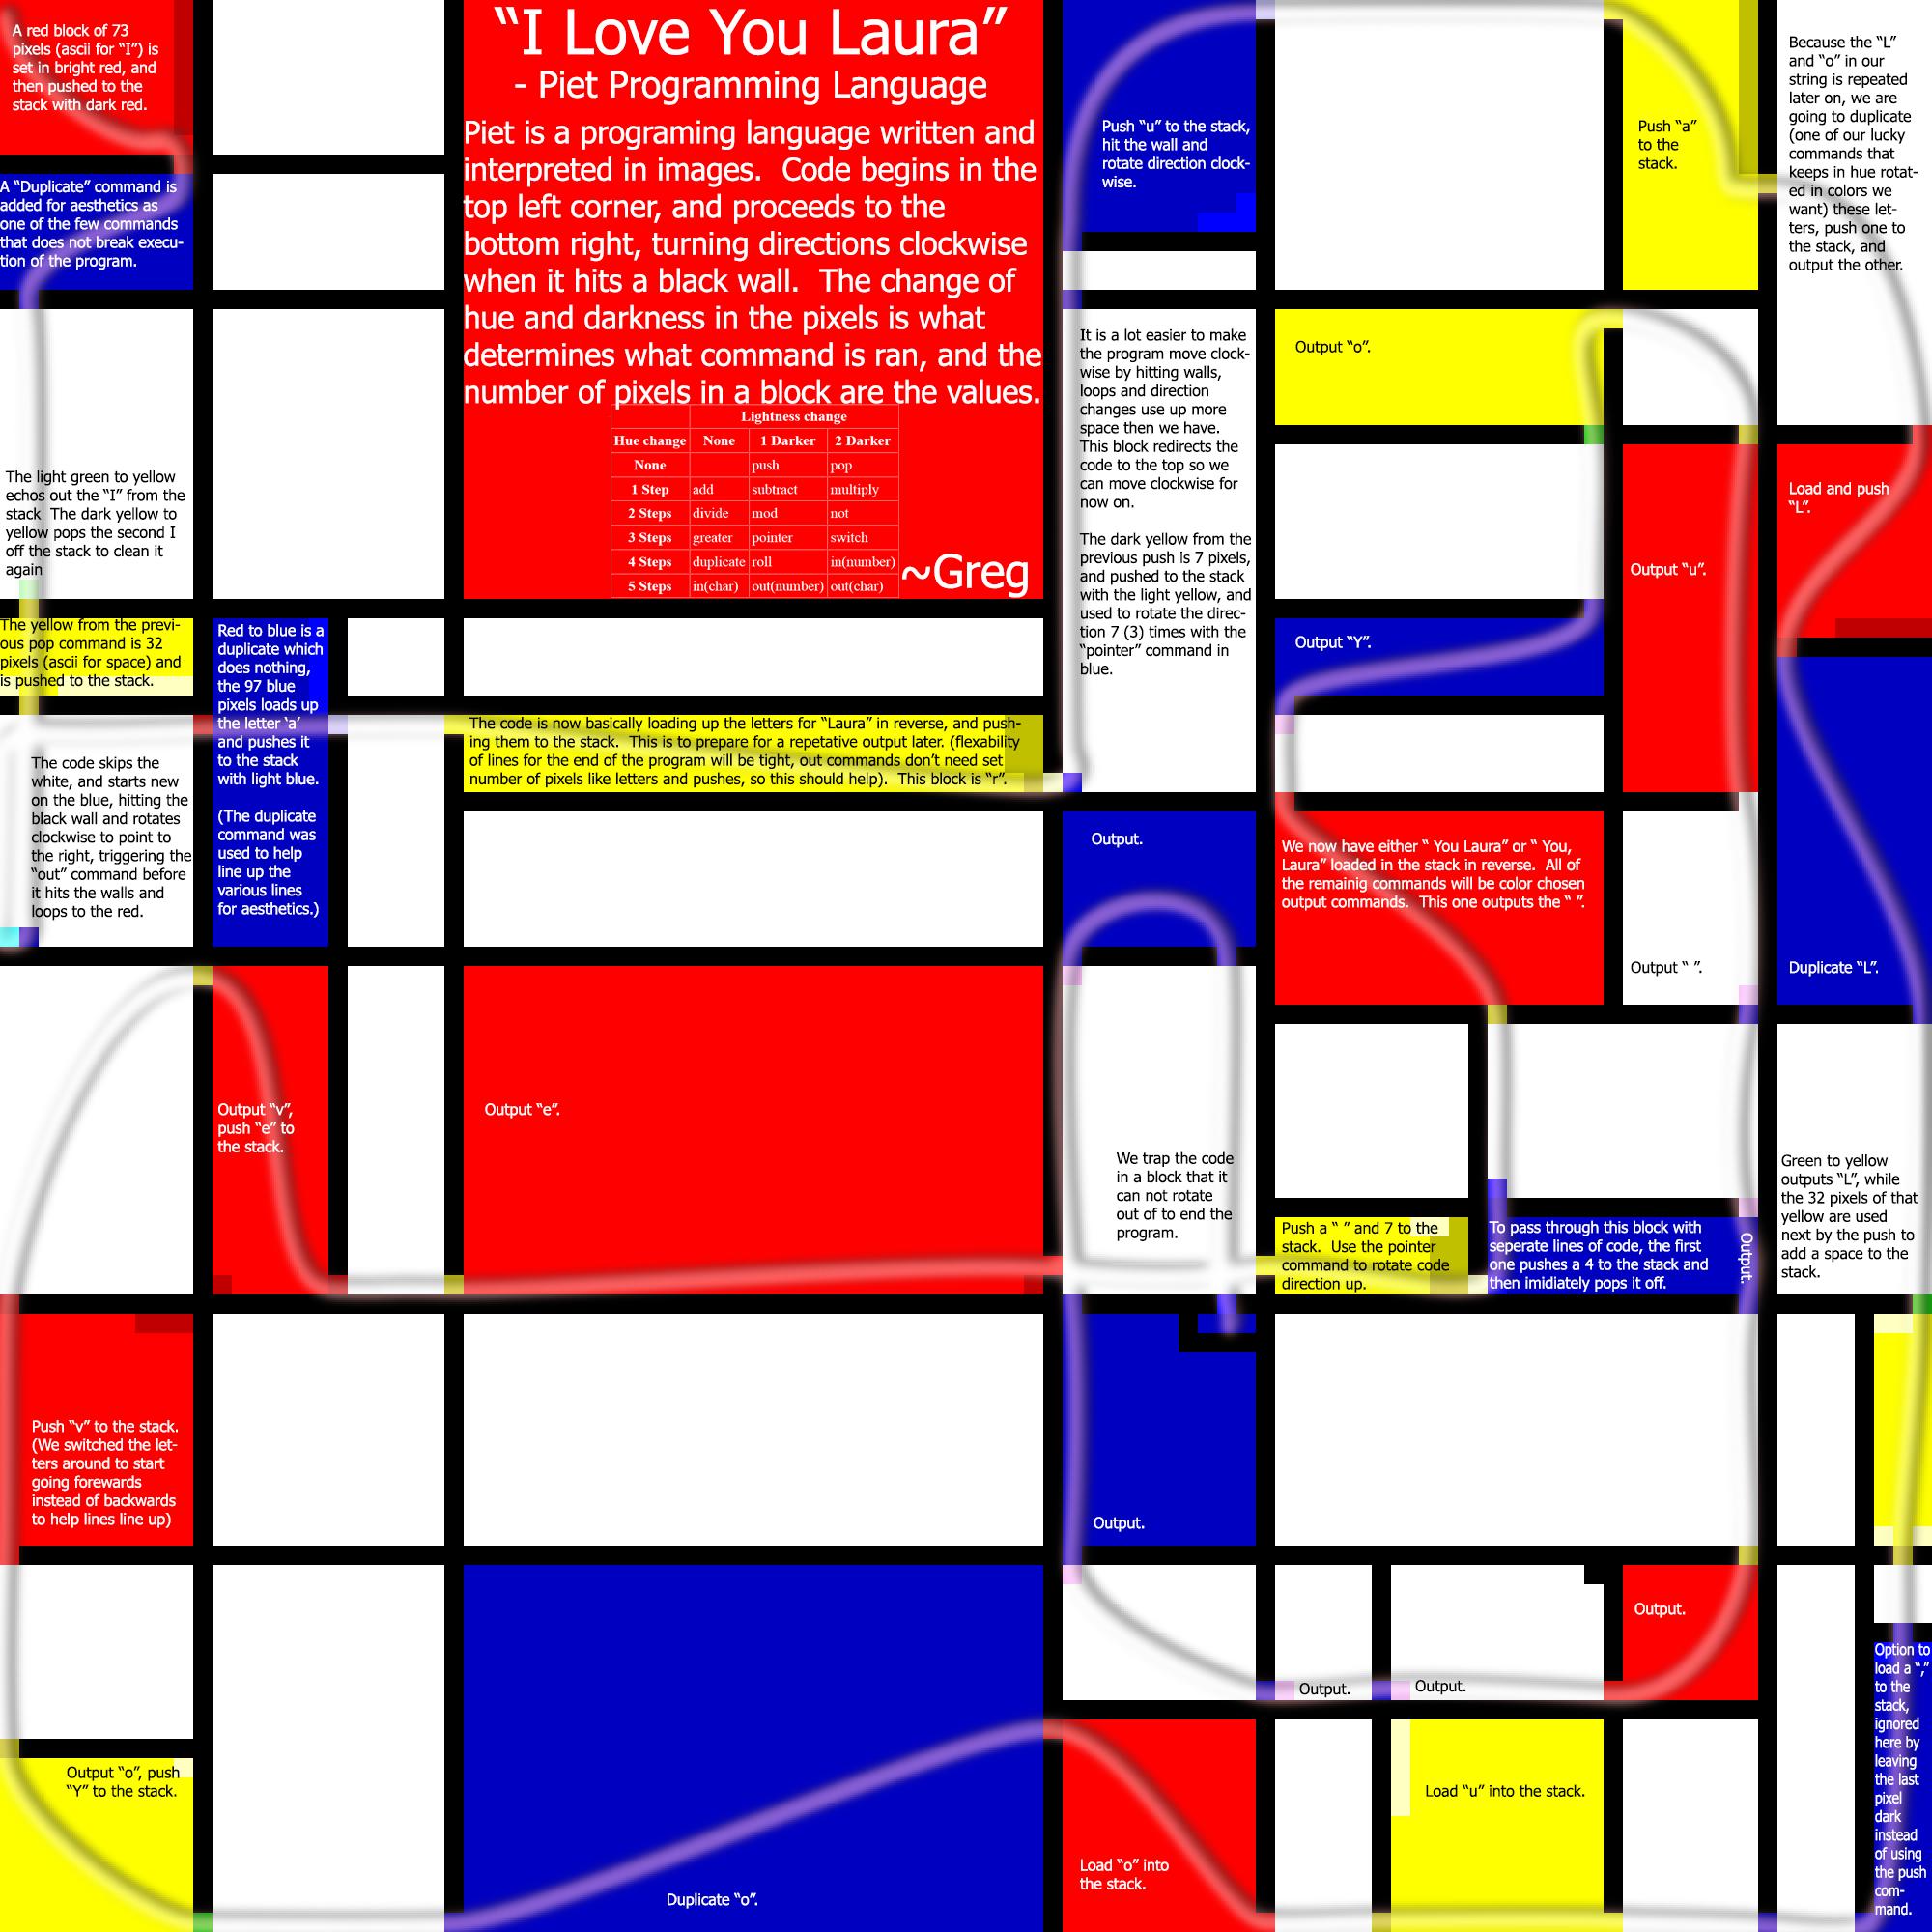 DM's Esoteric Programming Languages - Piet Samples